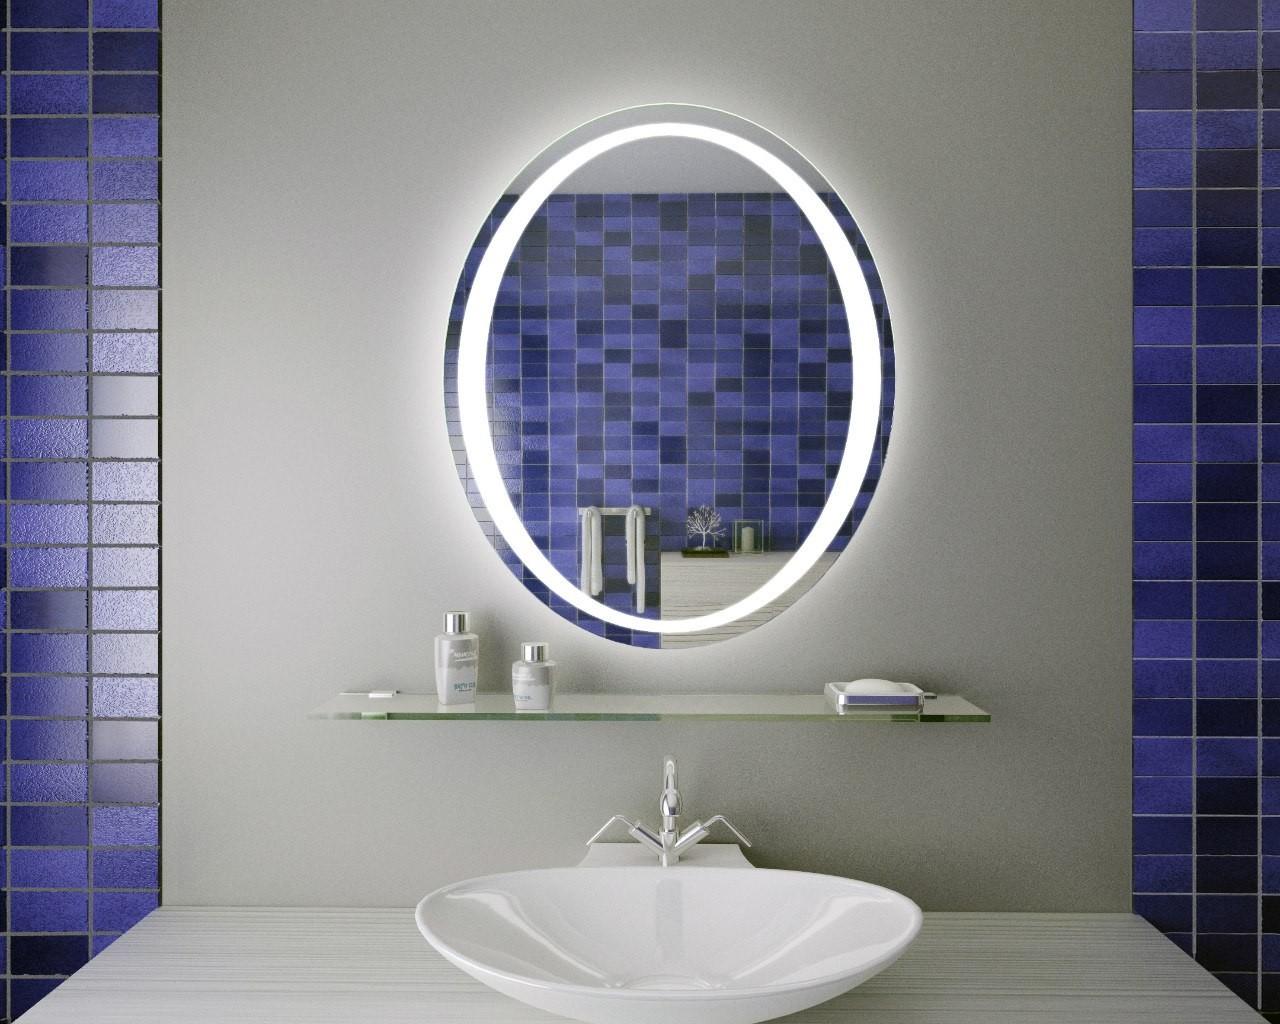 20 Bathroom Mirror Ideas  Best Decorative Bathroom Mirrors